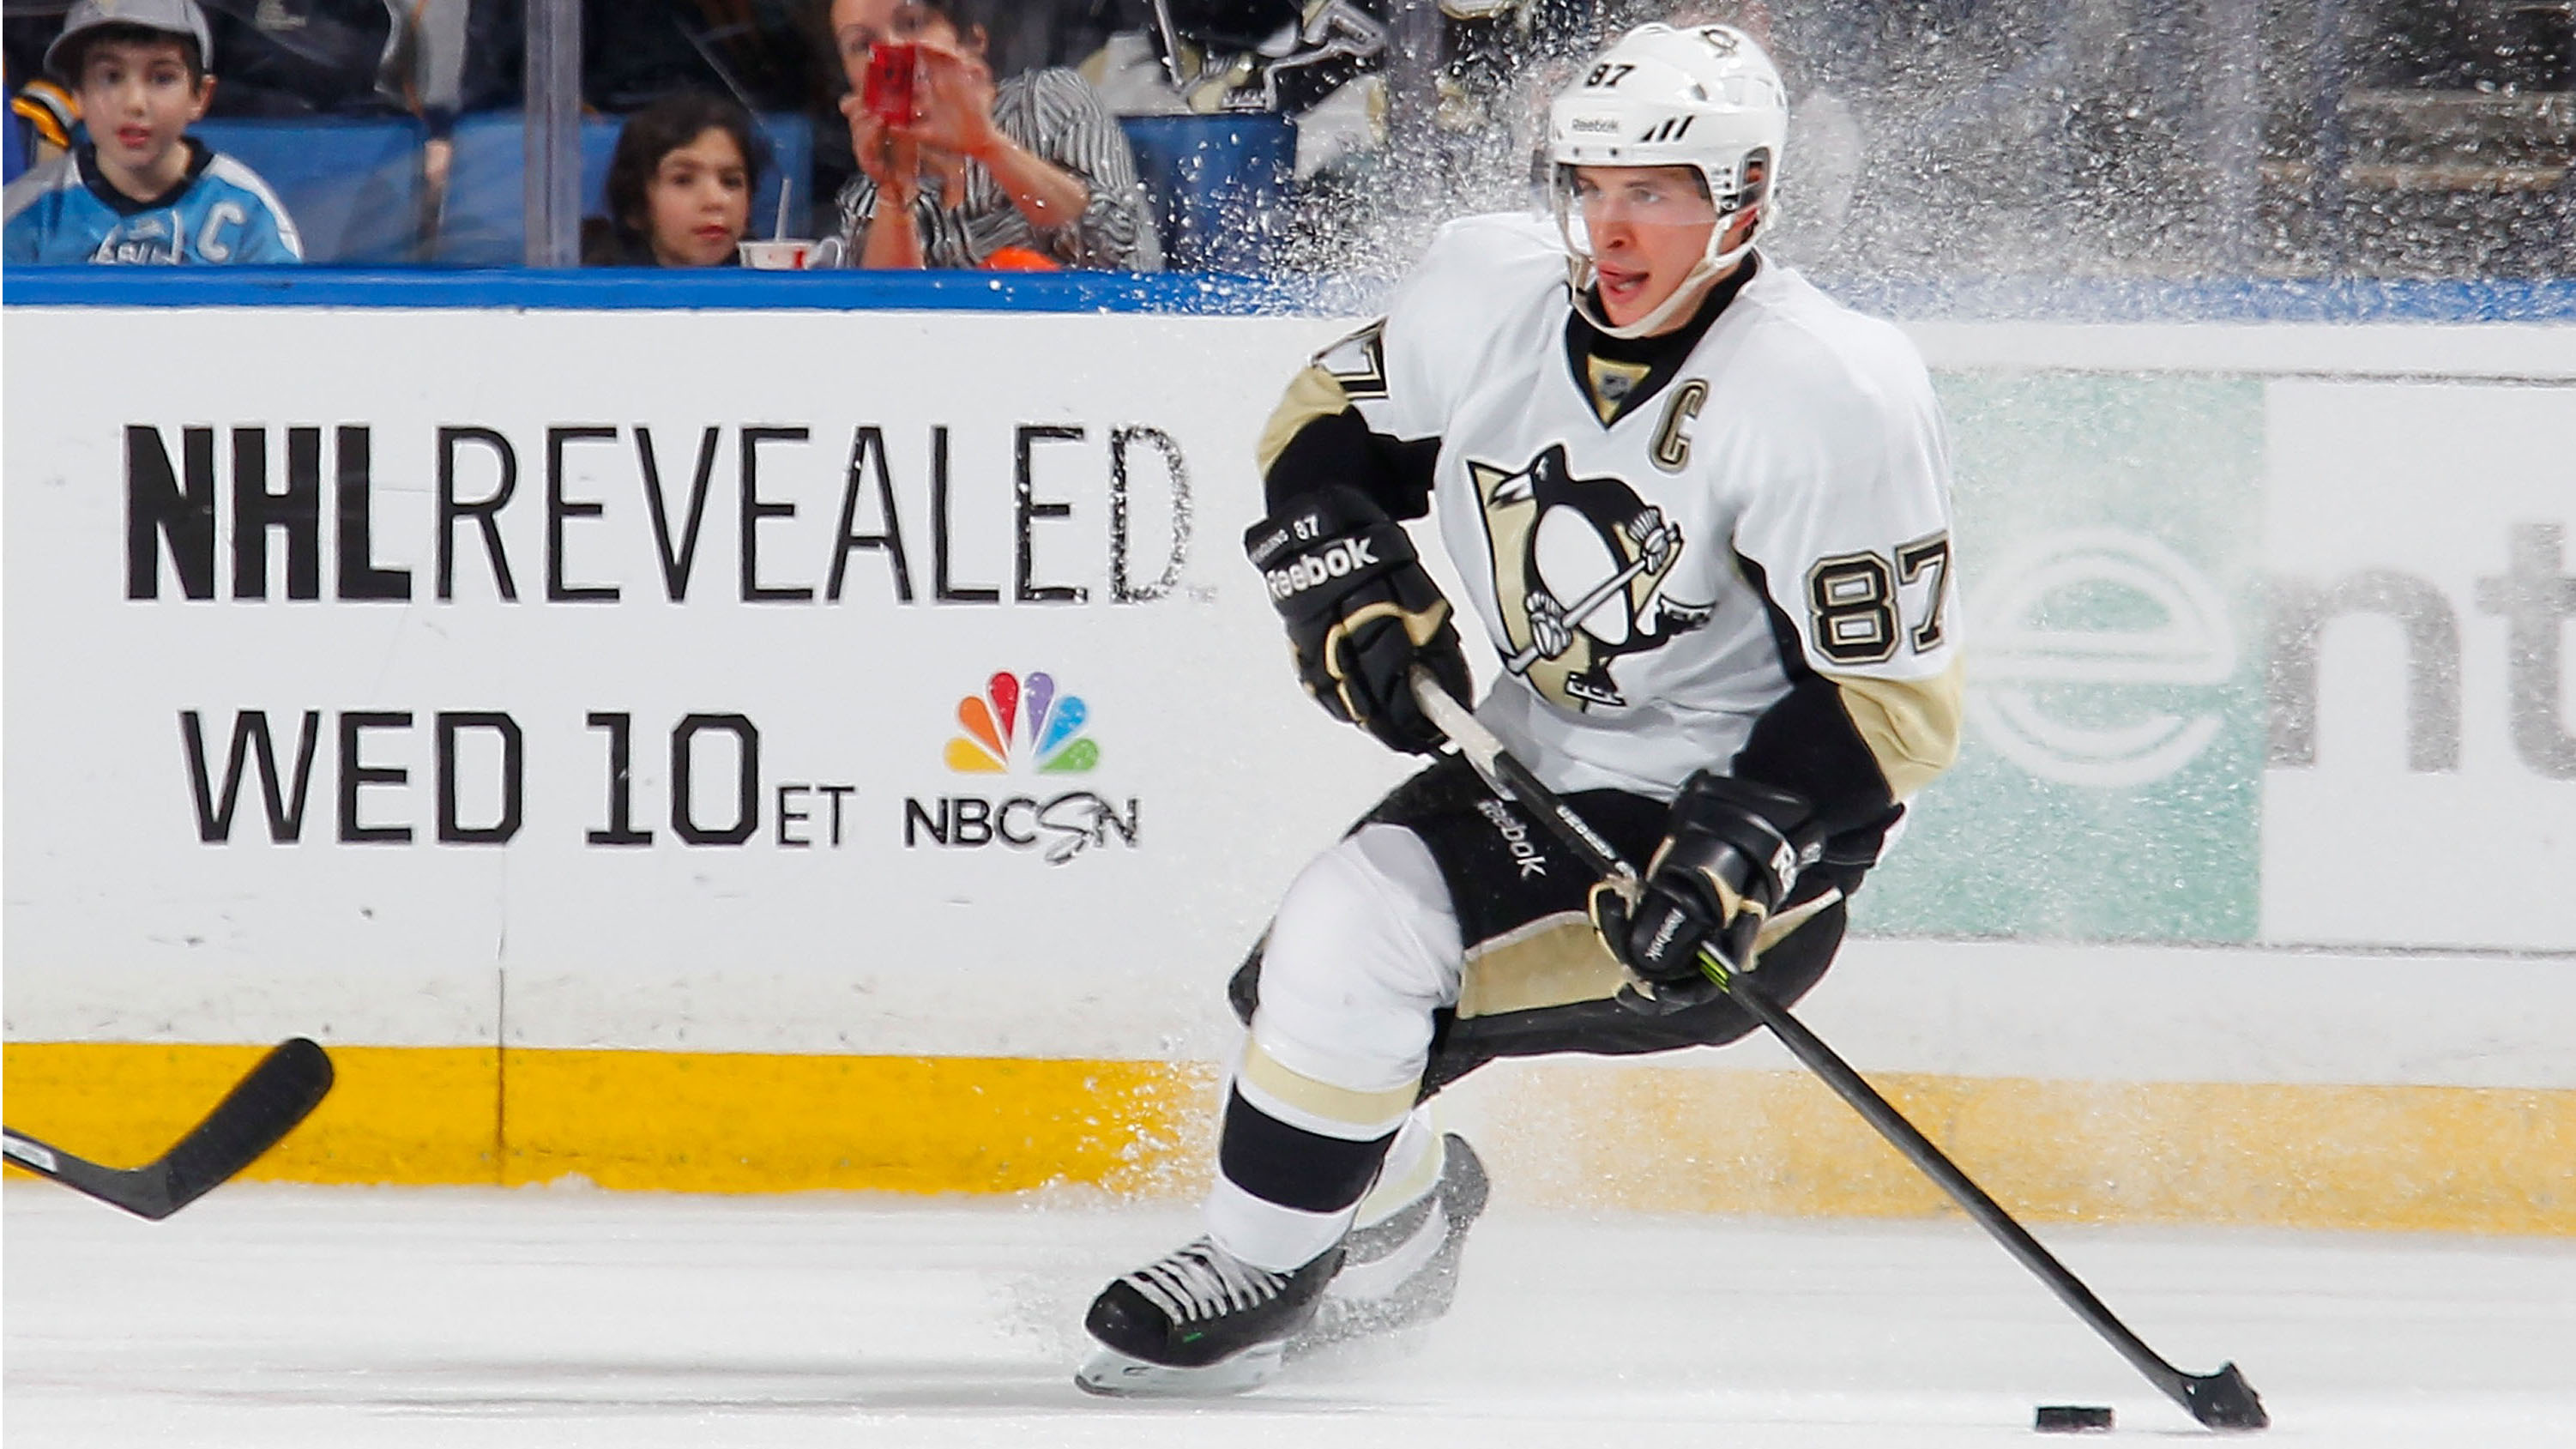 Penguins star Sidney Crosby to rehab wrist injury